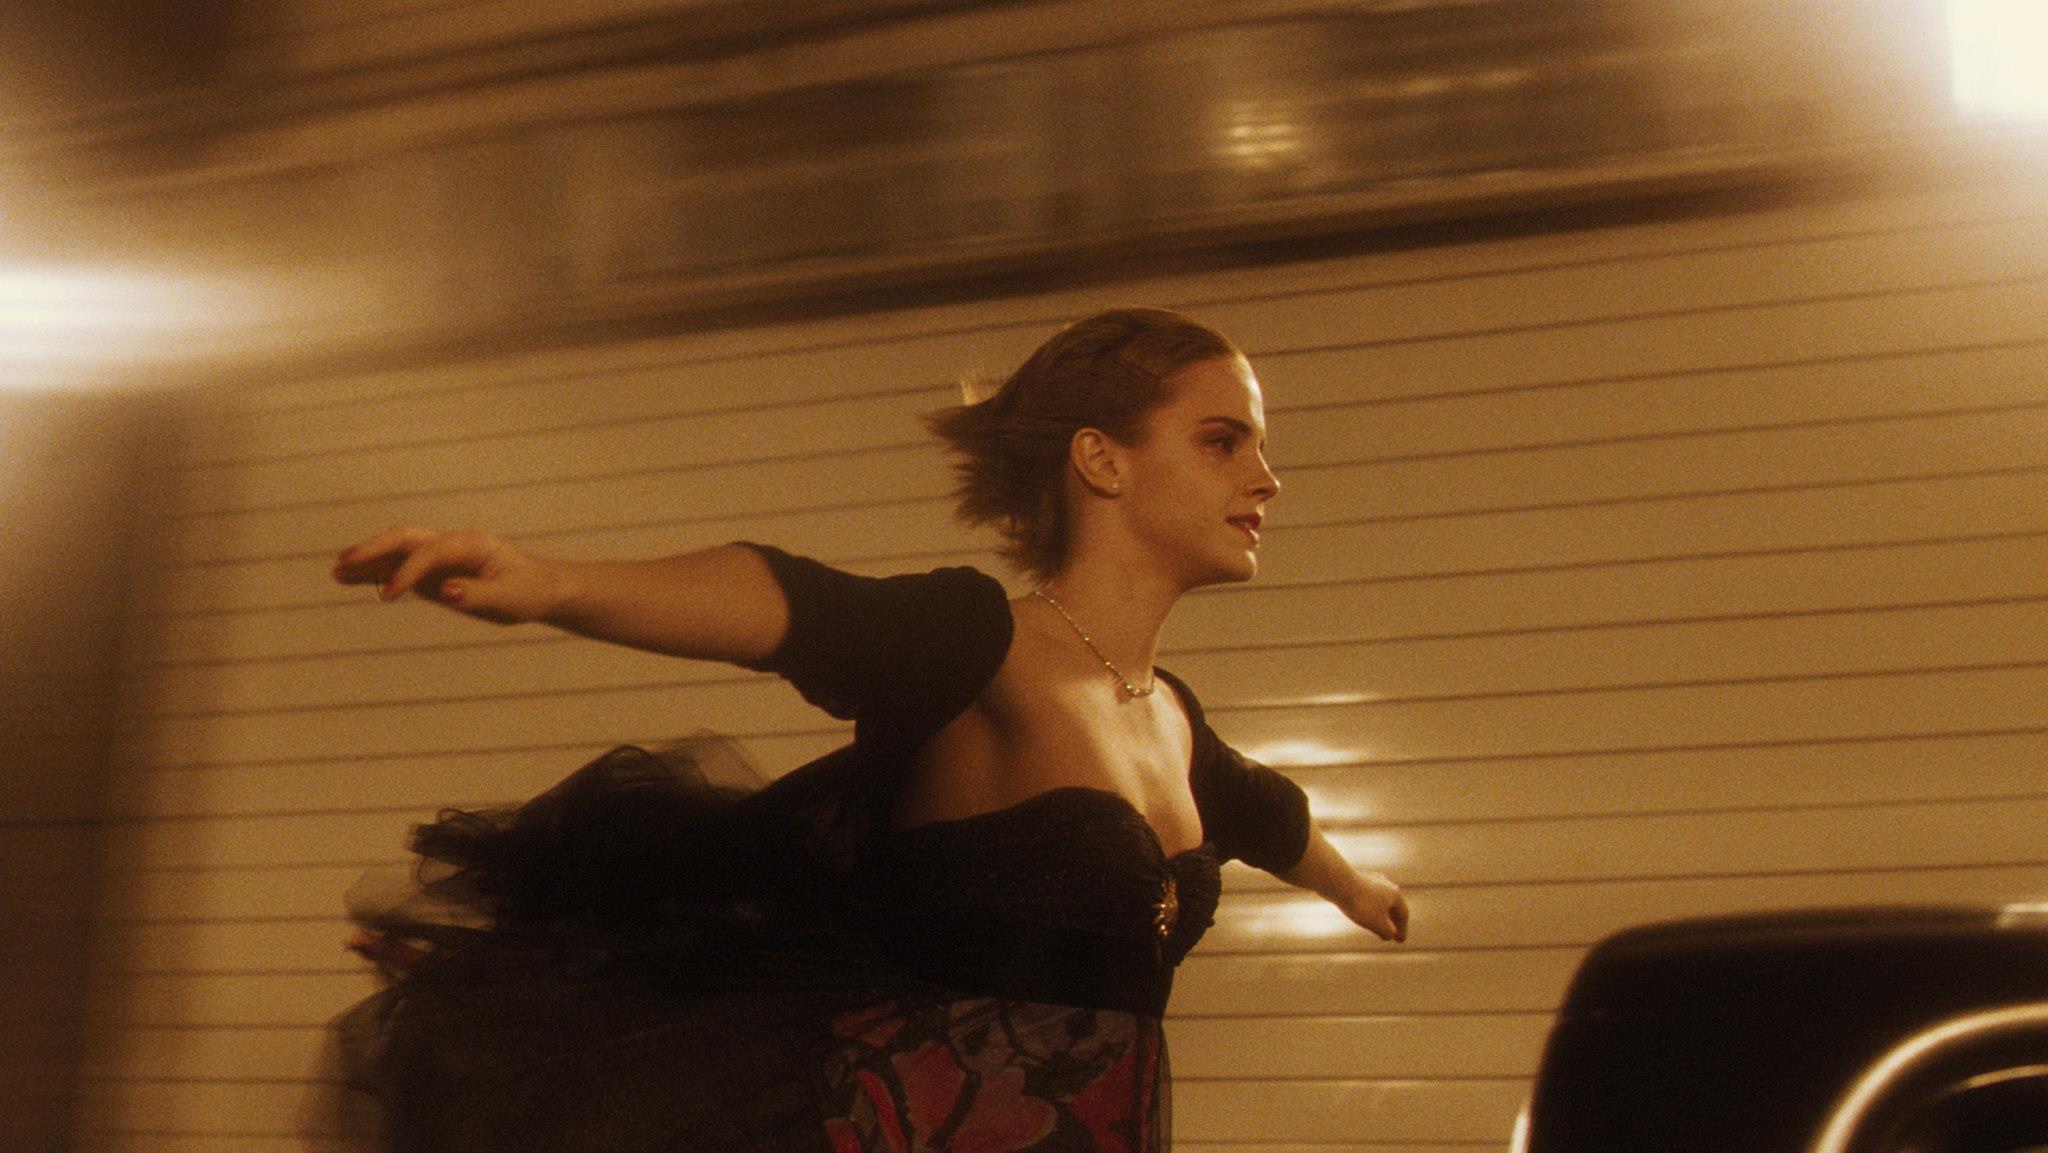 As vantagens de ser invisivel - Sam - Cena Tunel - Cinema de Buteco